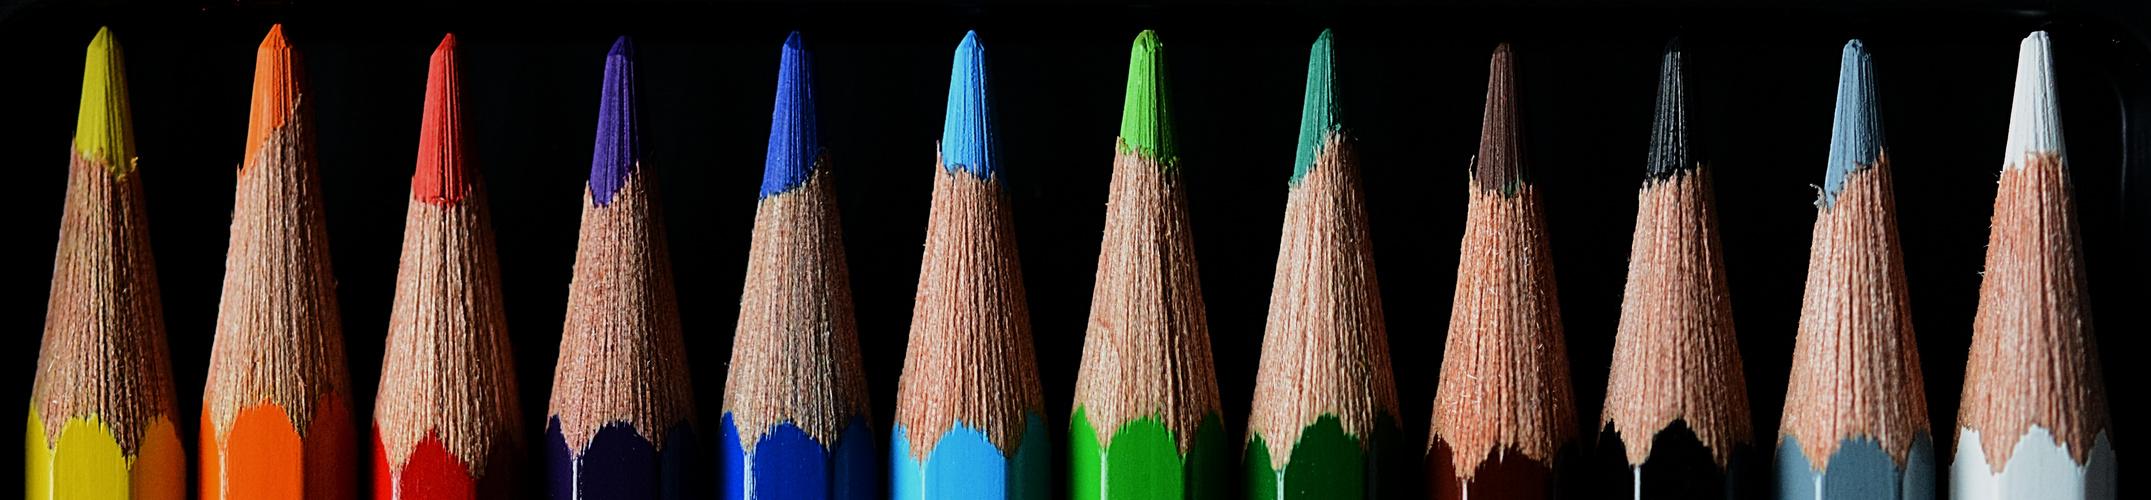 Color Stifte